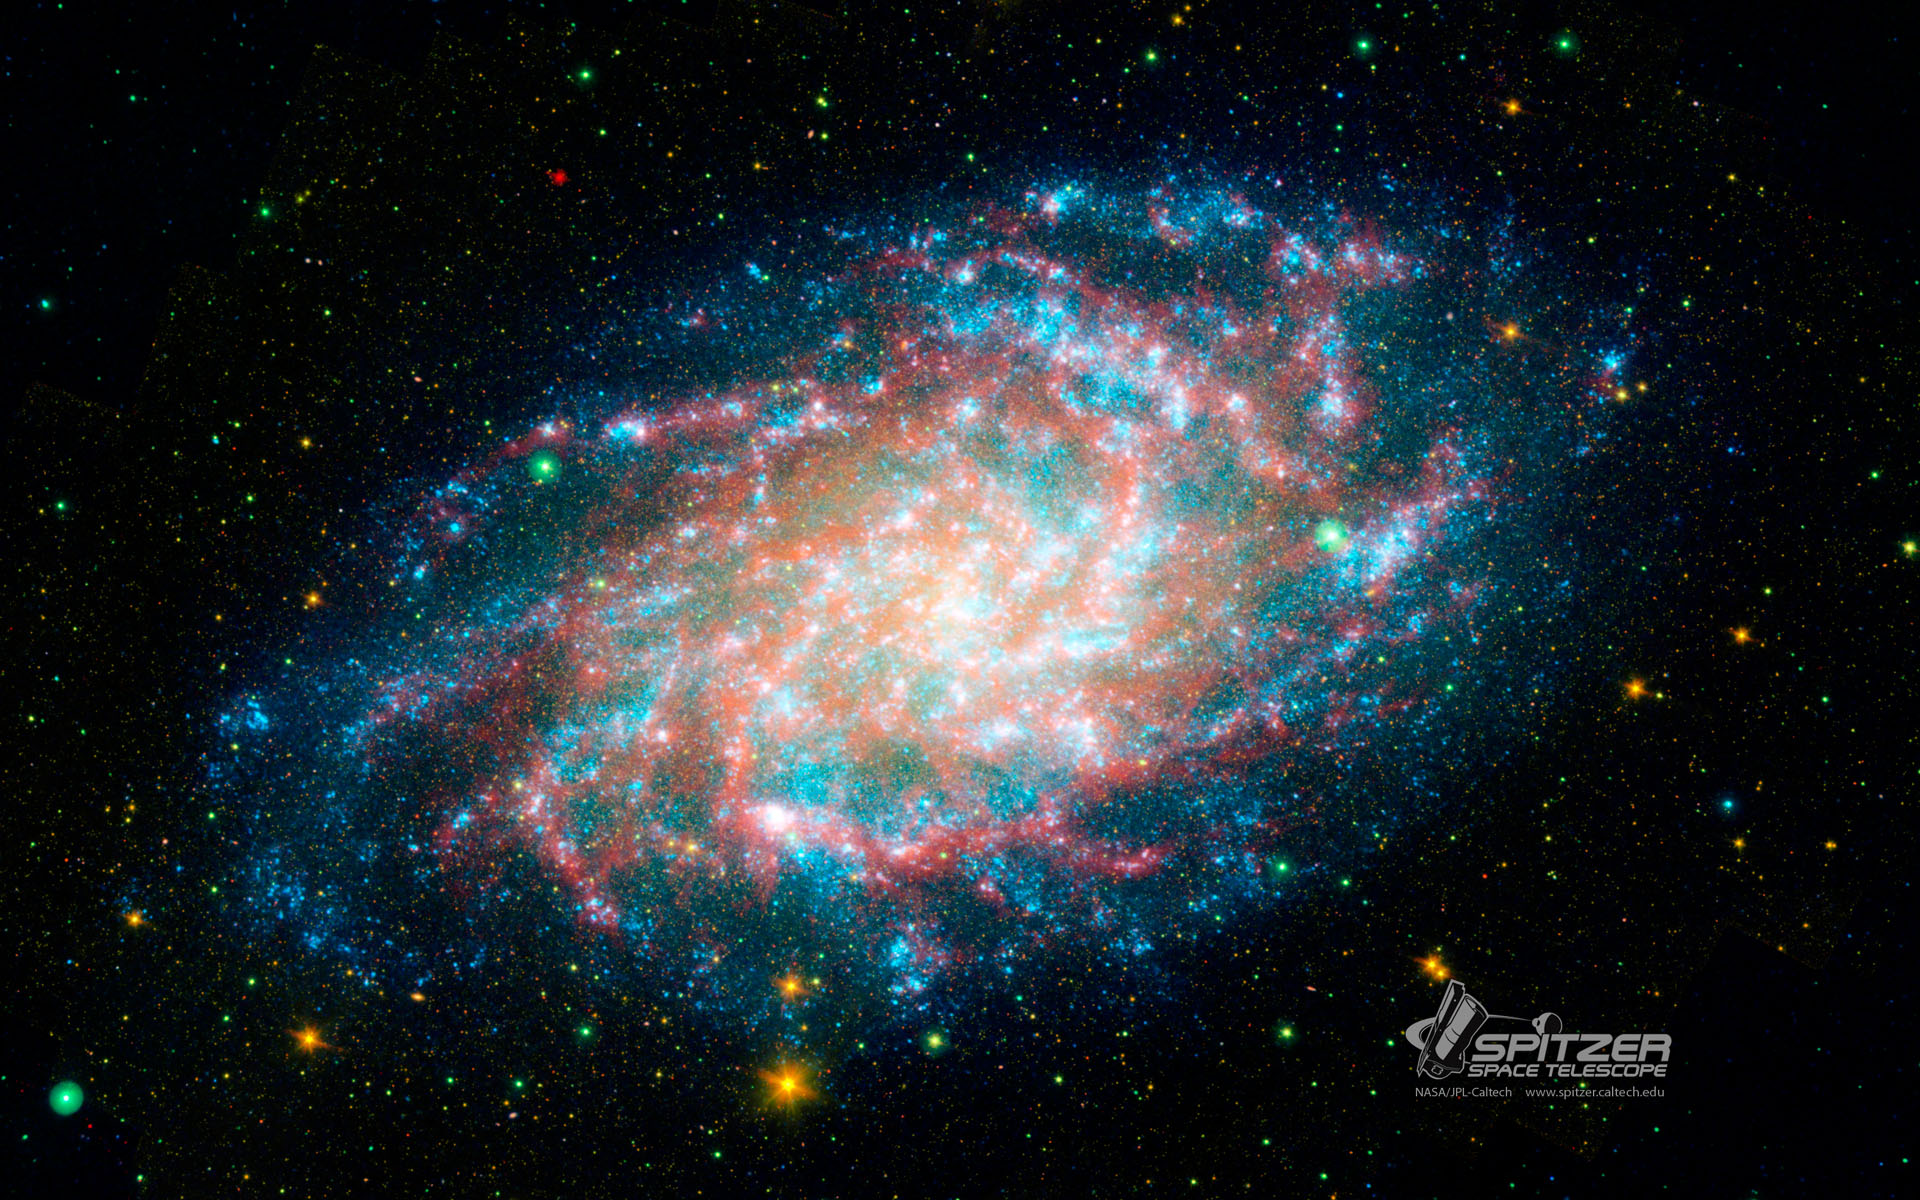 50 nasa wallpaper images on wallpapersafari - Spitzer space telescope wallpaper ...